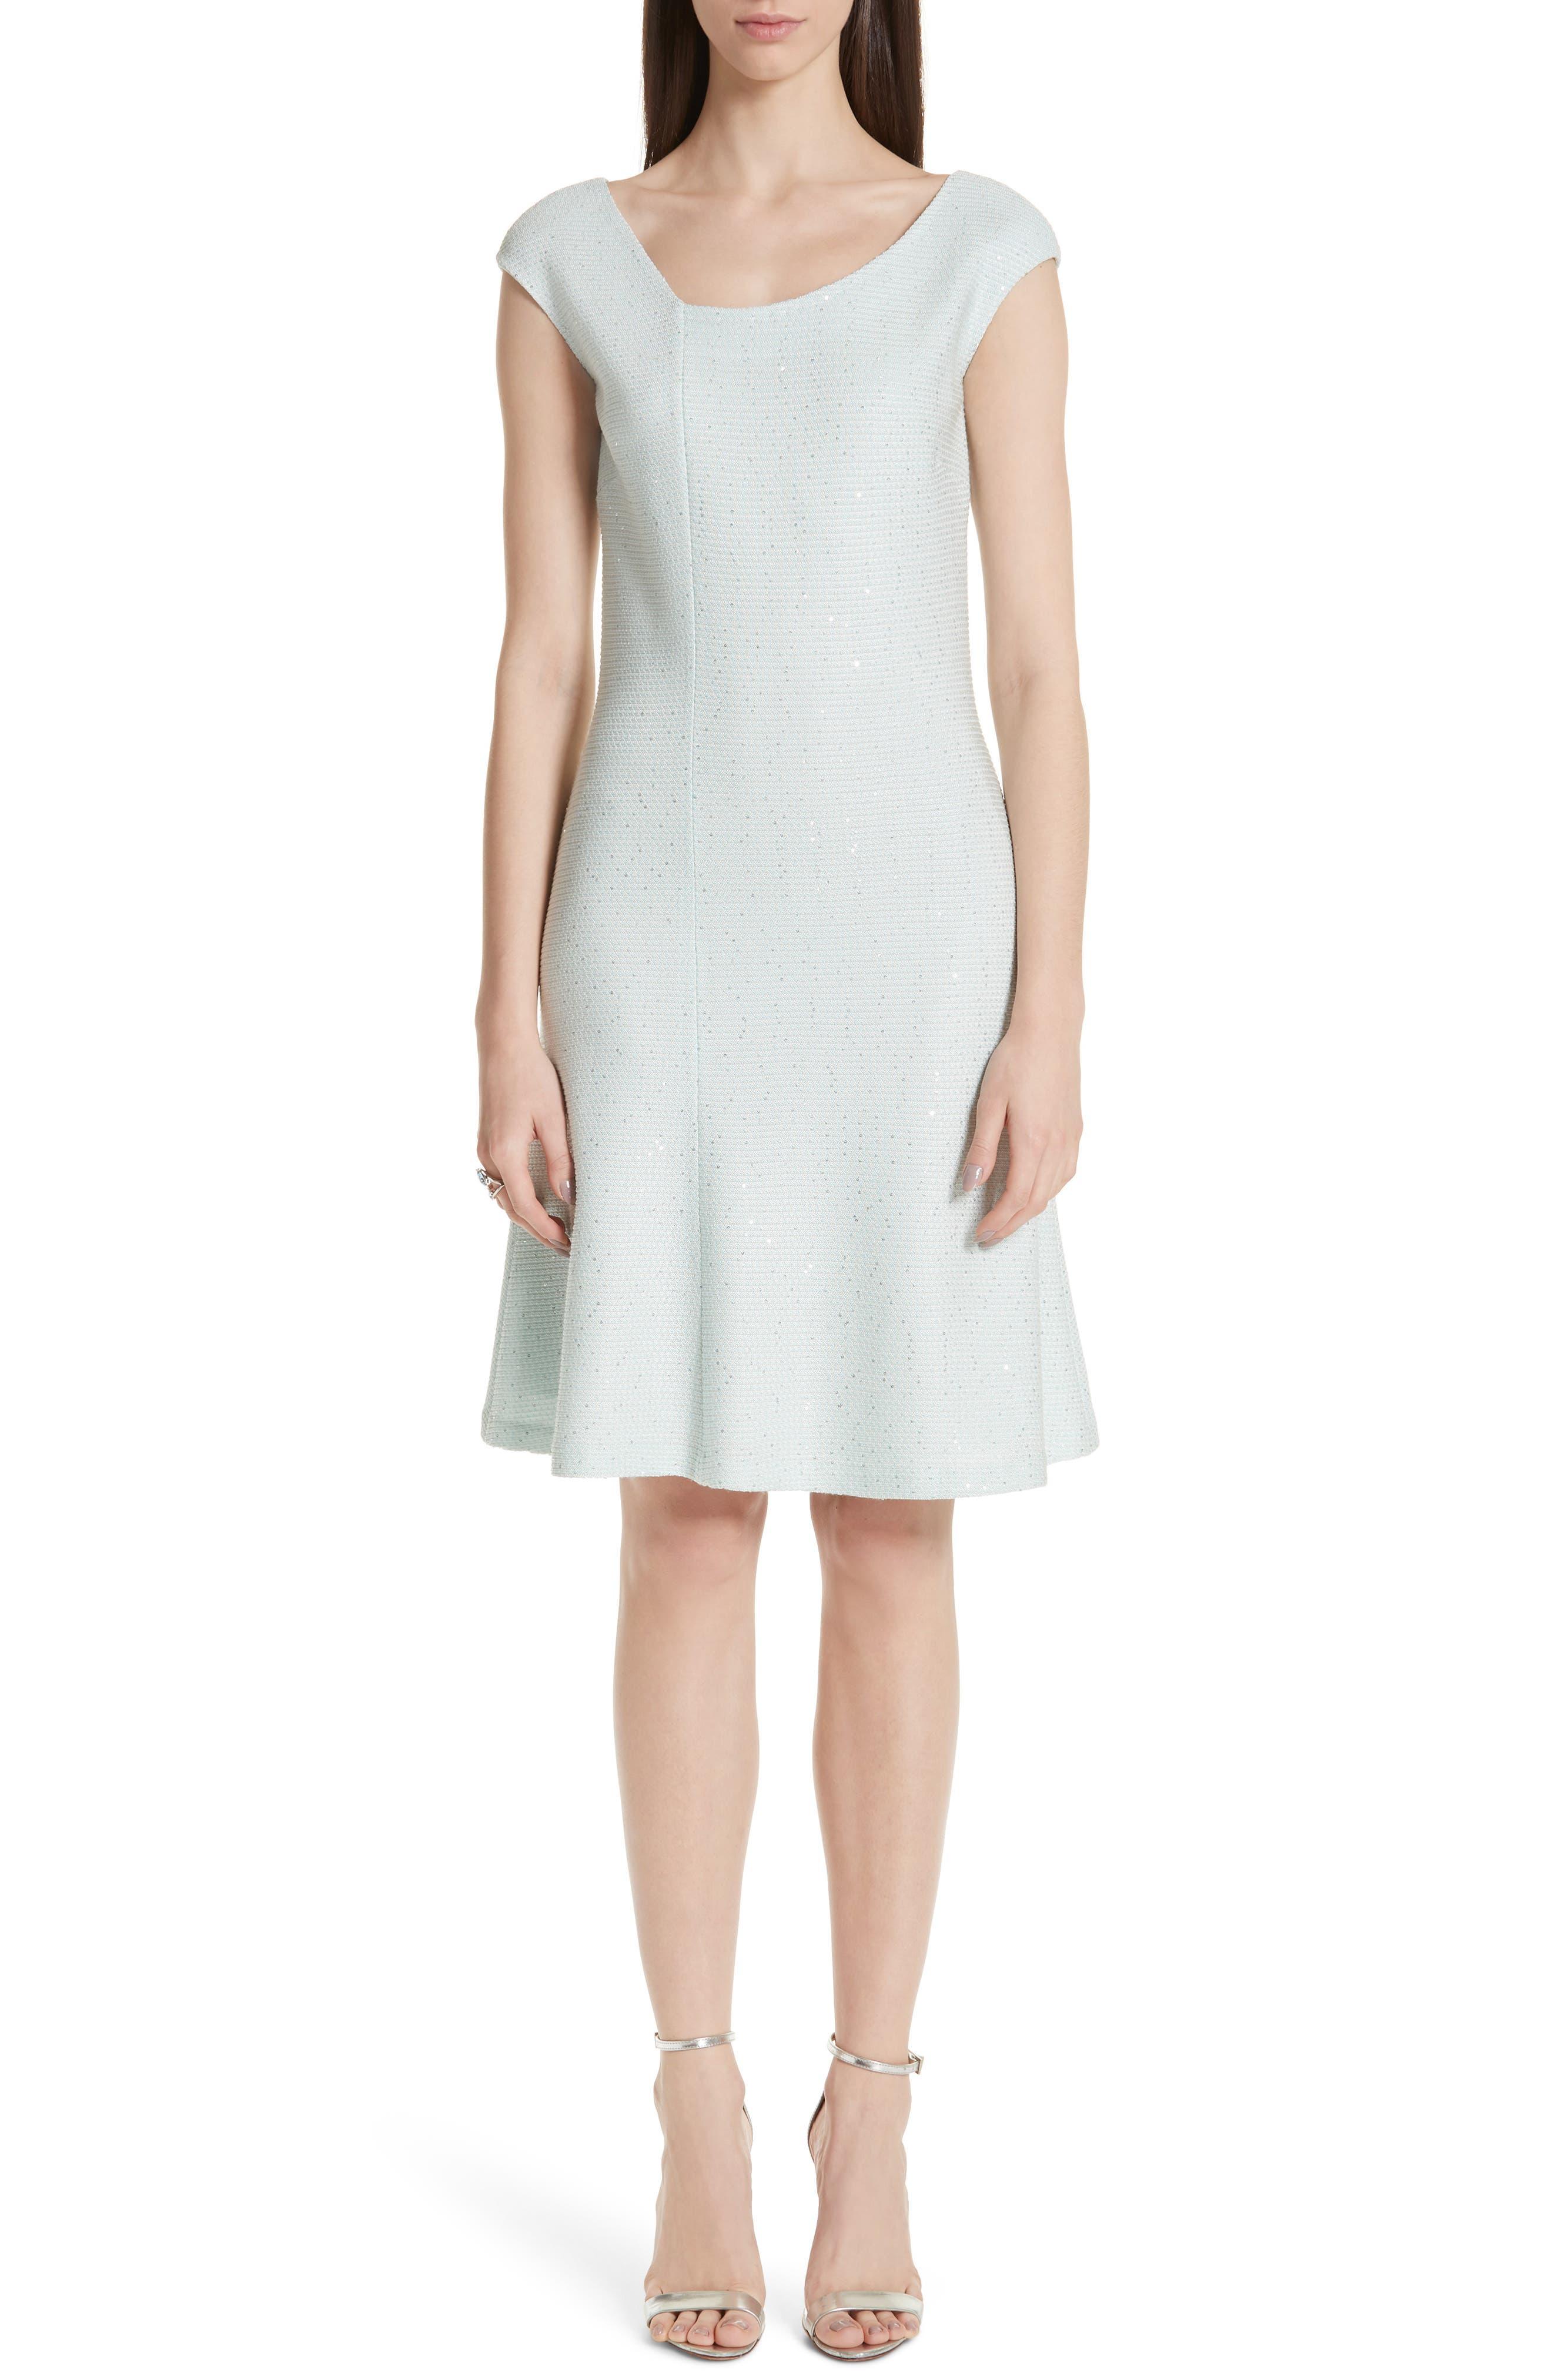 St. John Collection Links Asymmetrical Neck Sequin Knit Dress, Blue